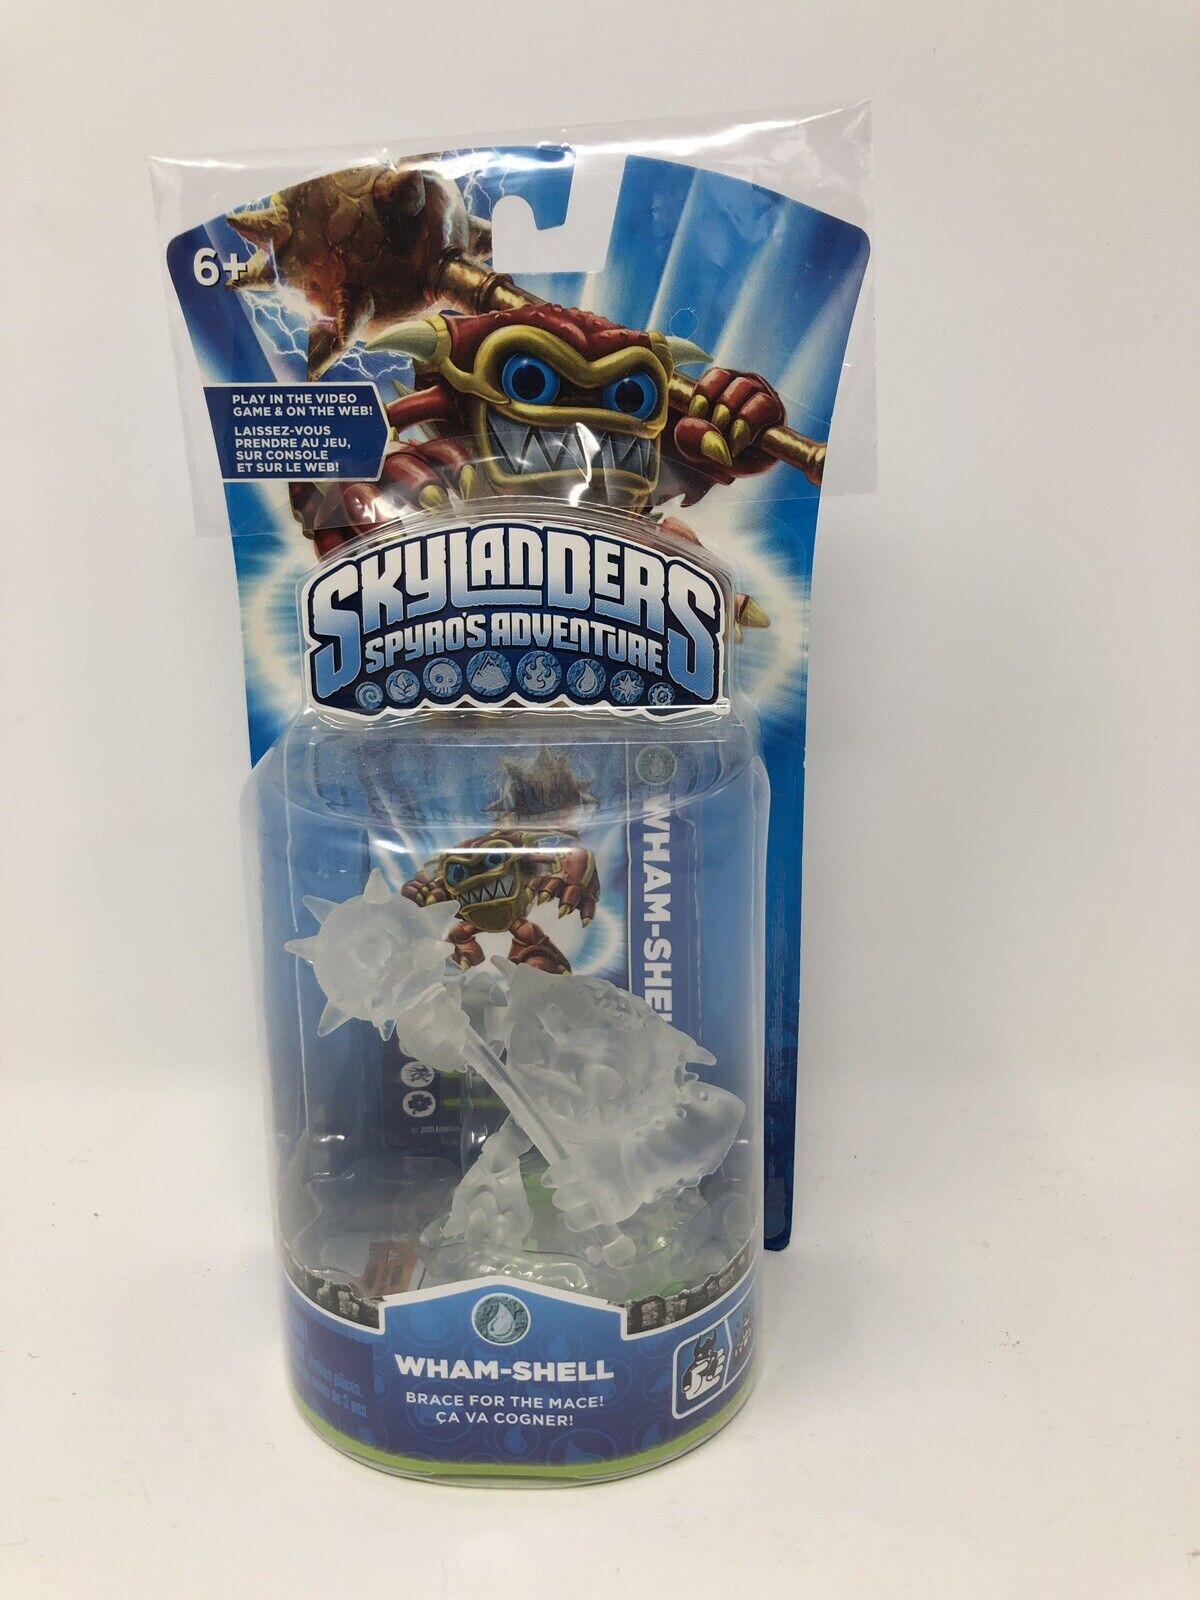 RARE Skylanders Spyros Adventure Crystal Clear Translucent Wham-Shell